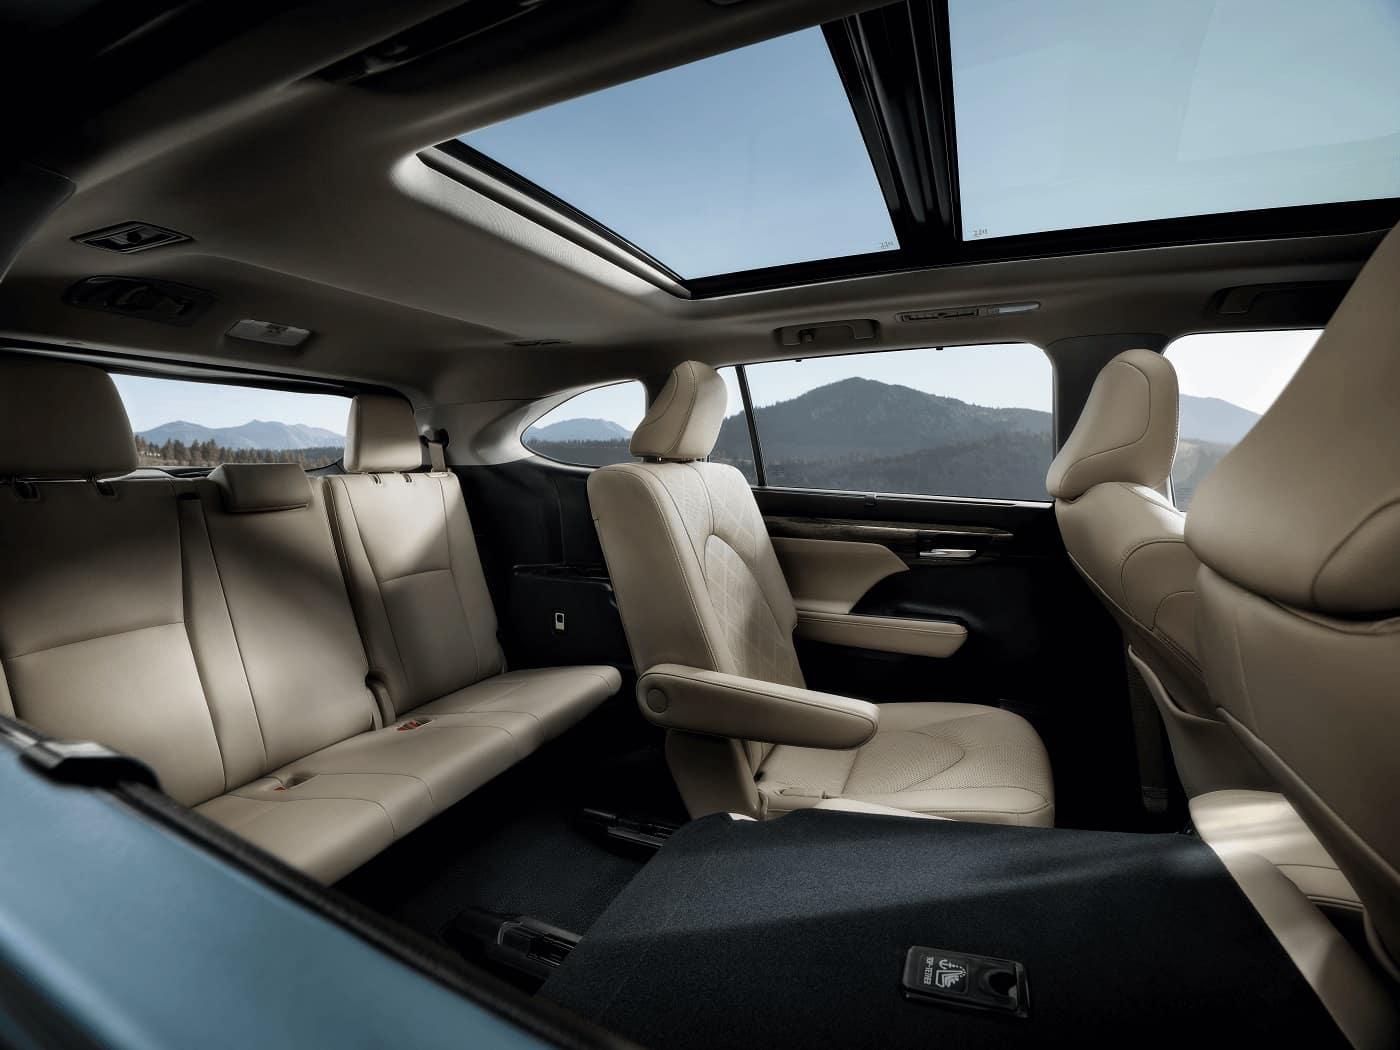 Toyota Highlander Interior Cabin